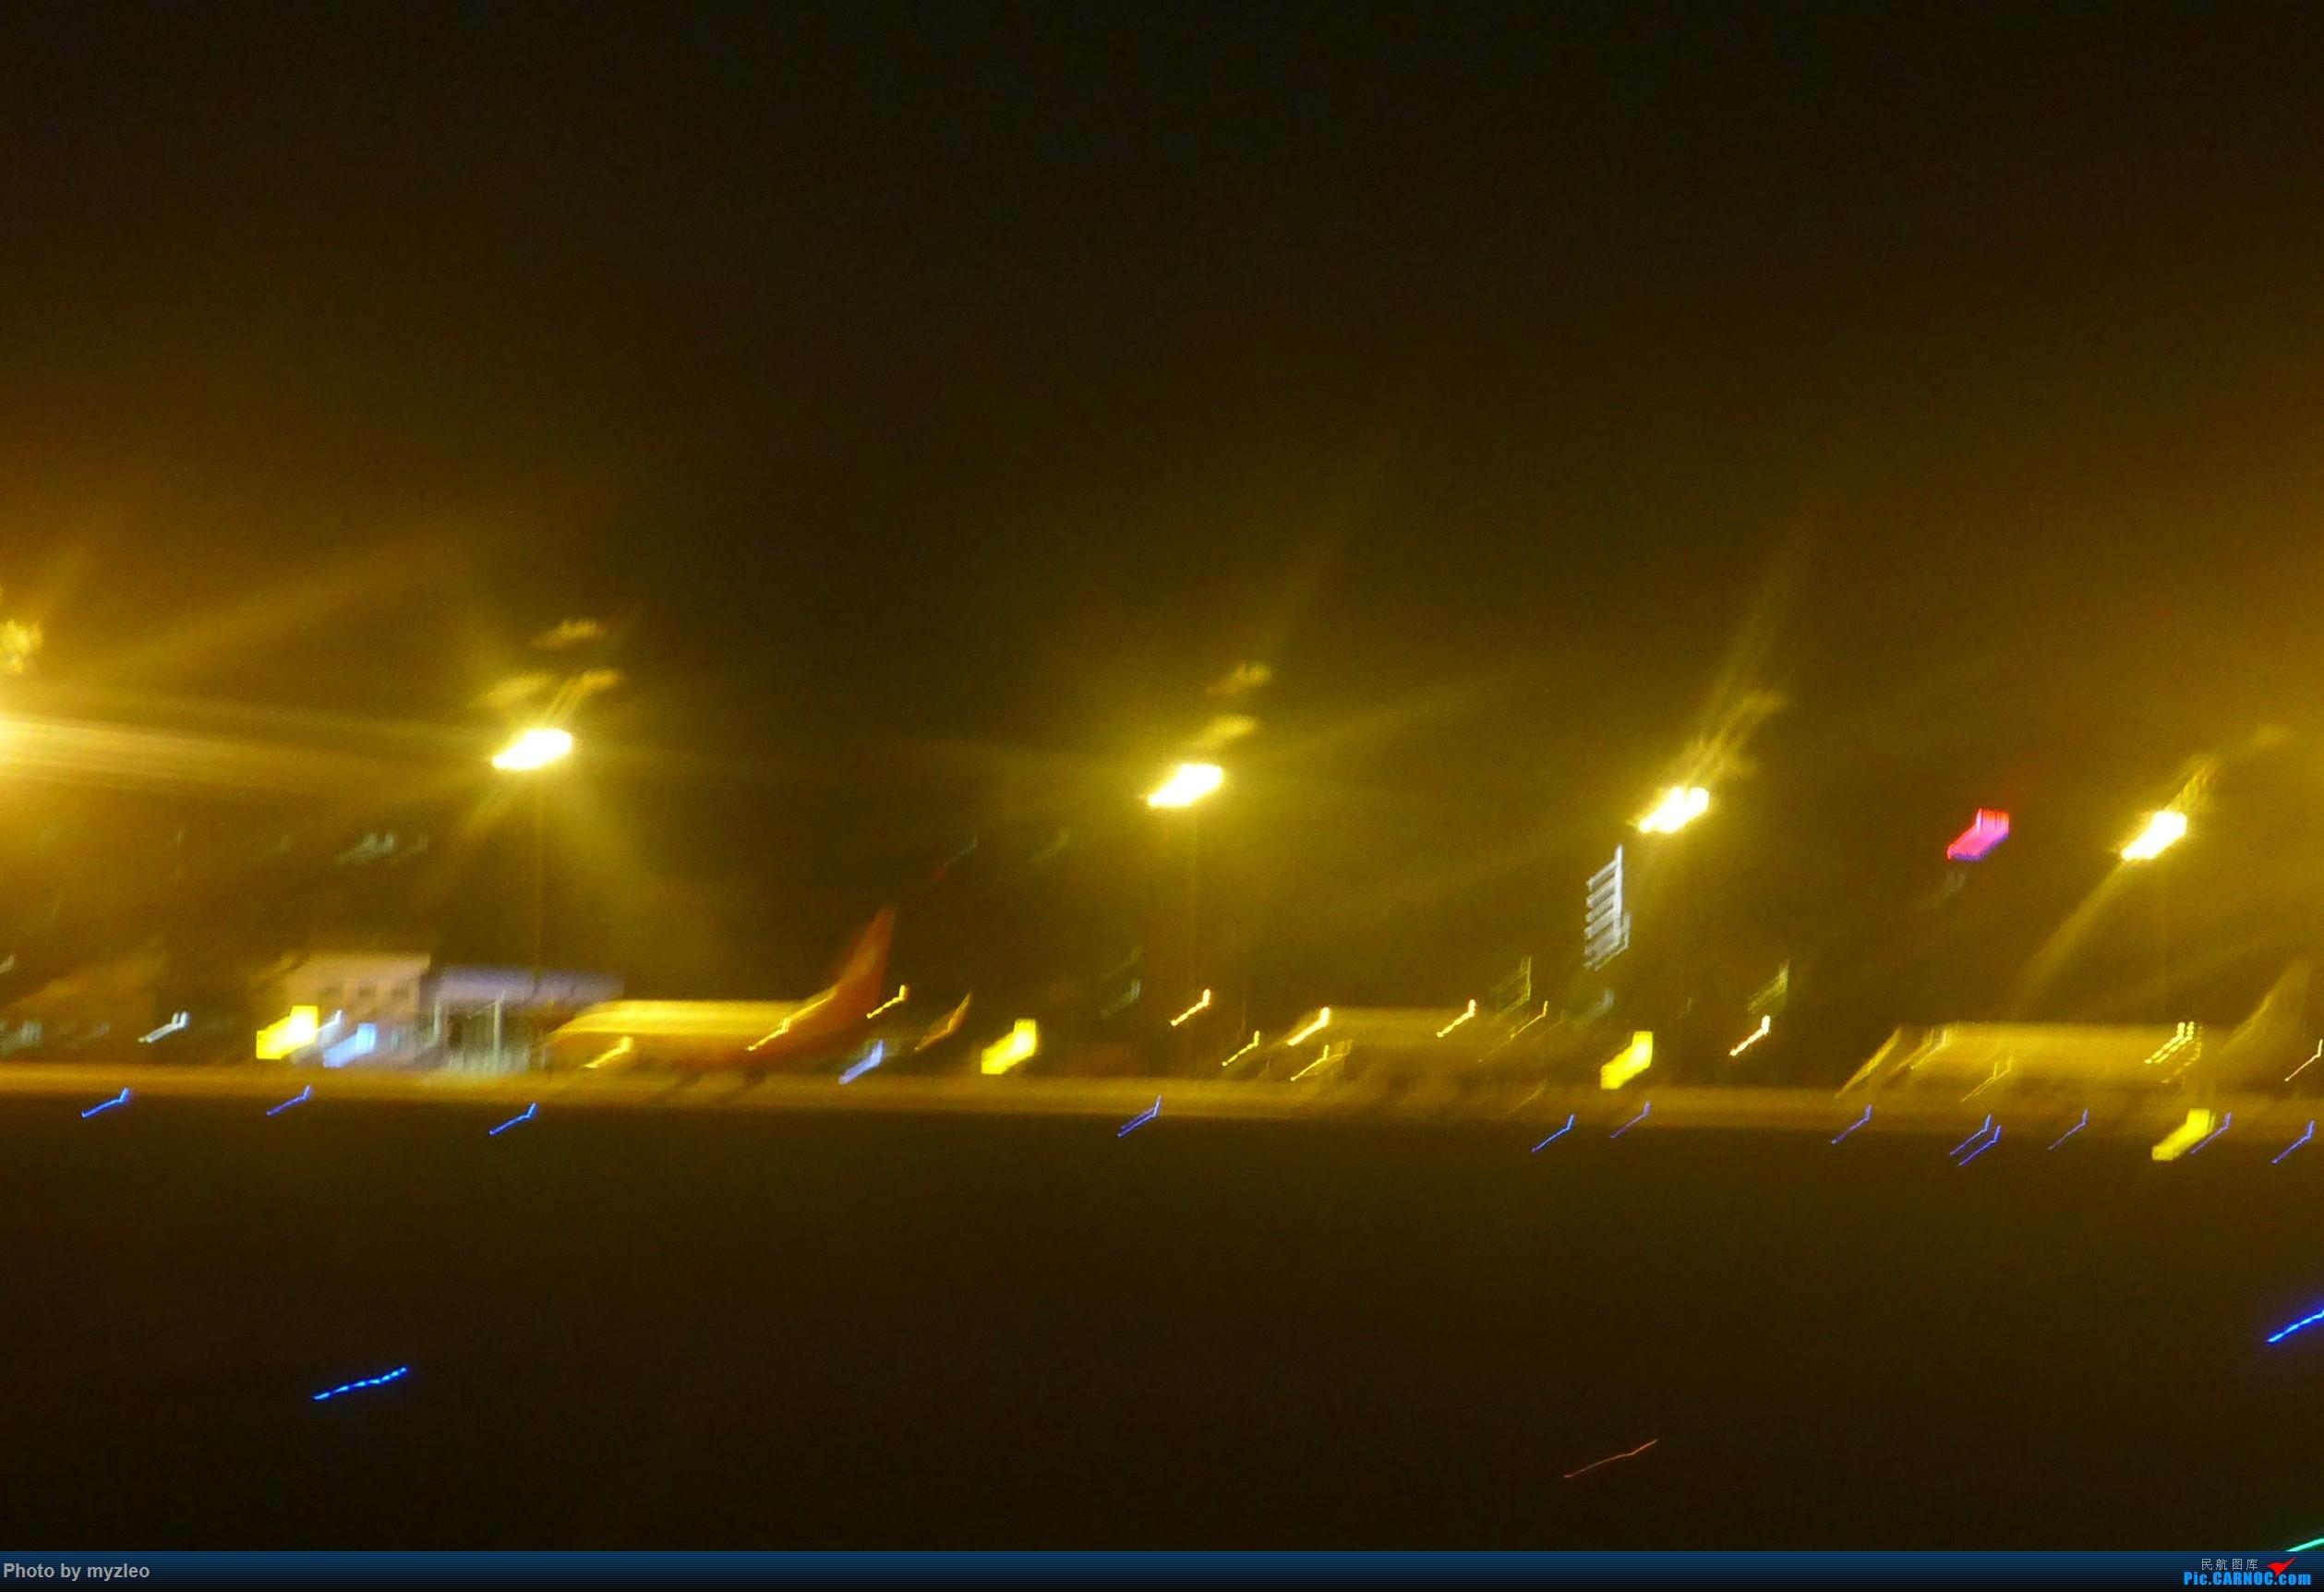 Re:[原创]【myzleo的游记2.2】昆洱风光(2)——去大理+人在大理+不舍返沪 BOEING 737-700 B-5809  中国上海虹桥国际机场